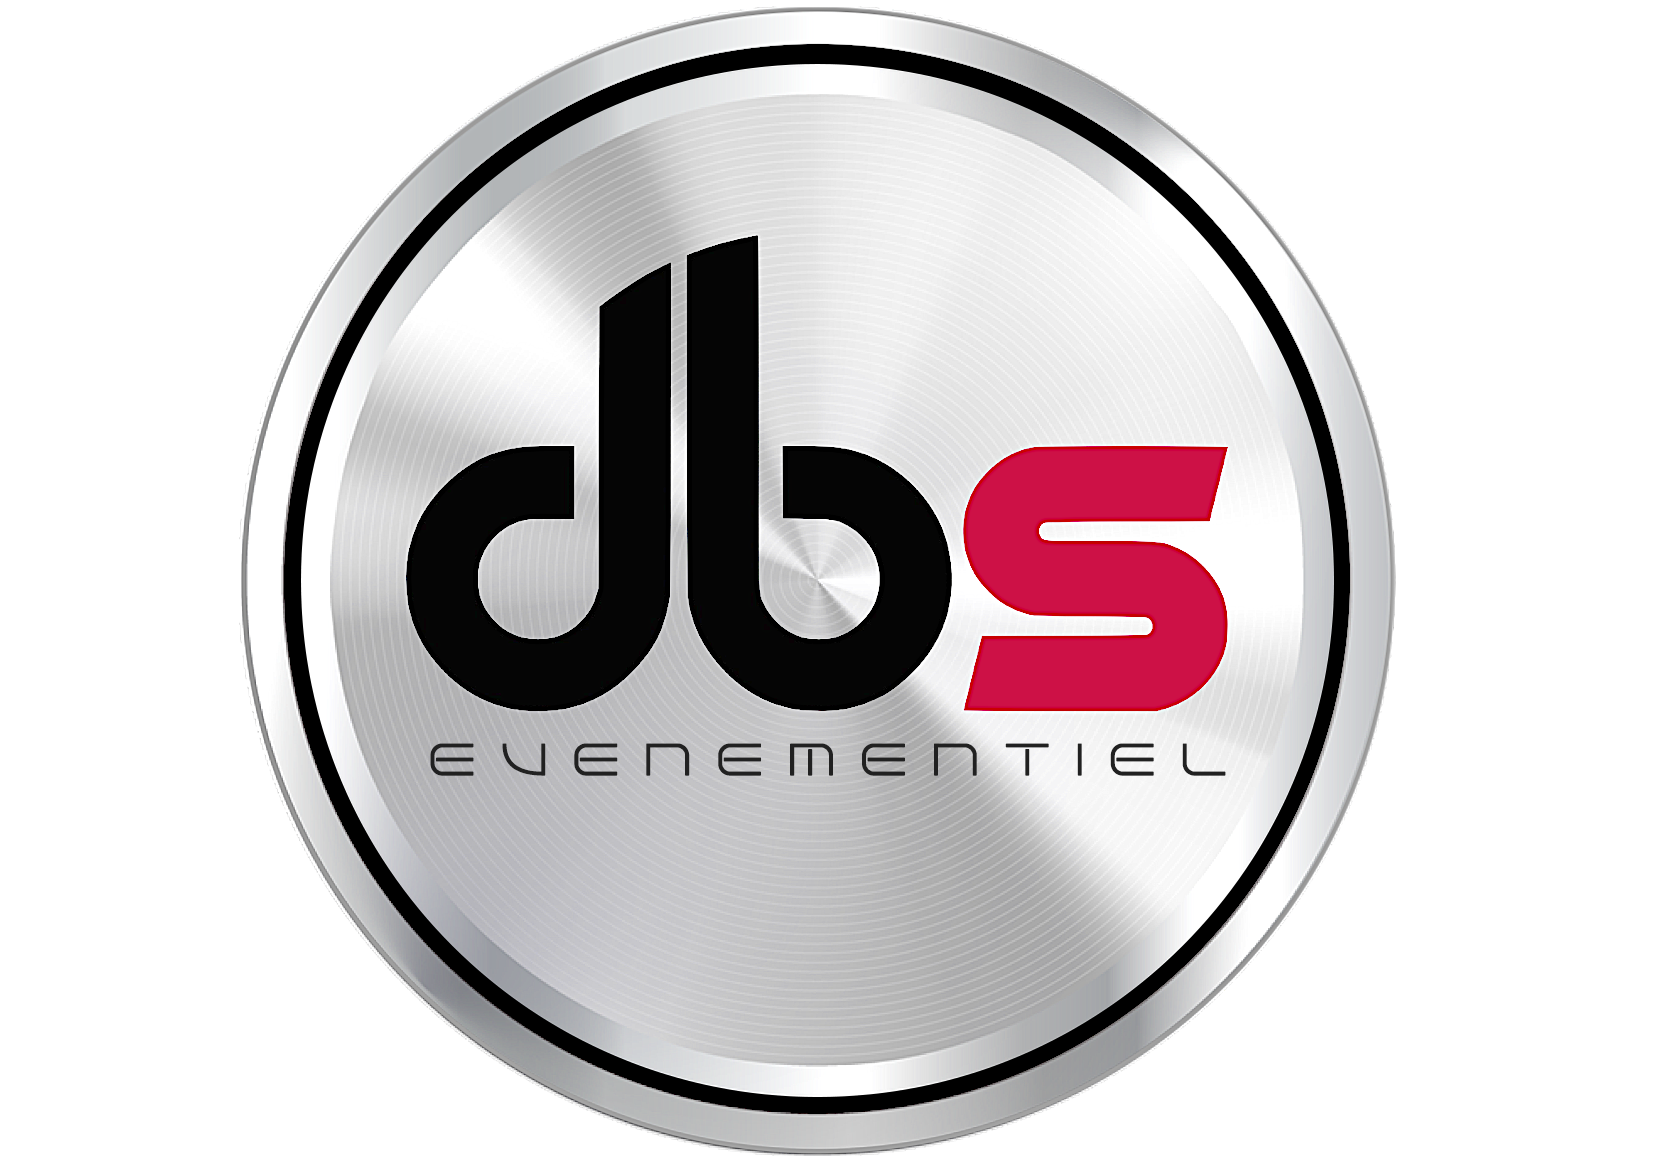 DBS événementiel